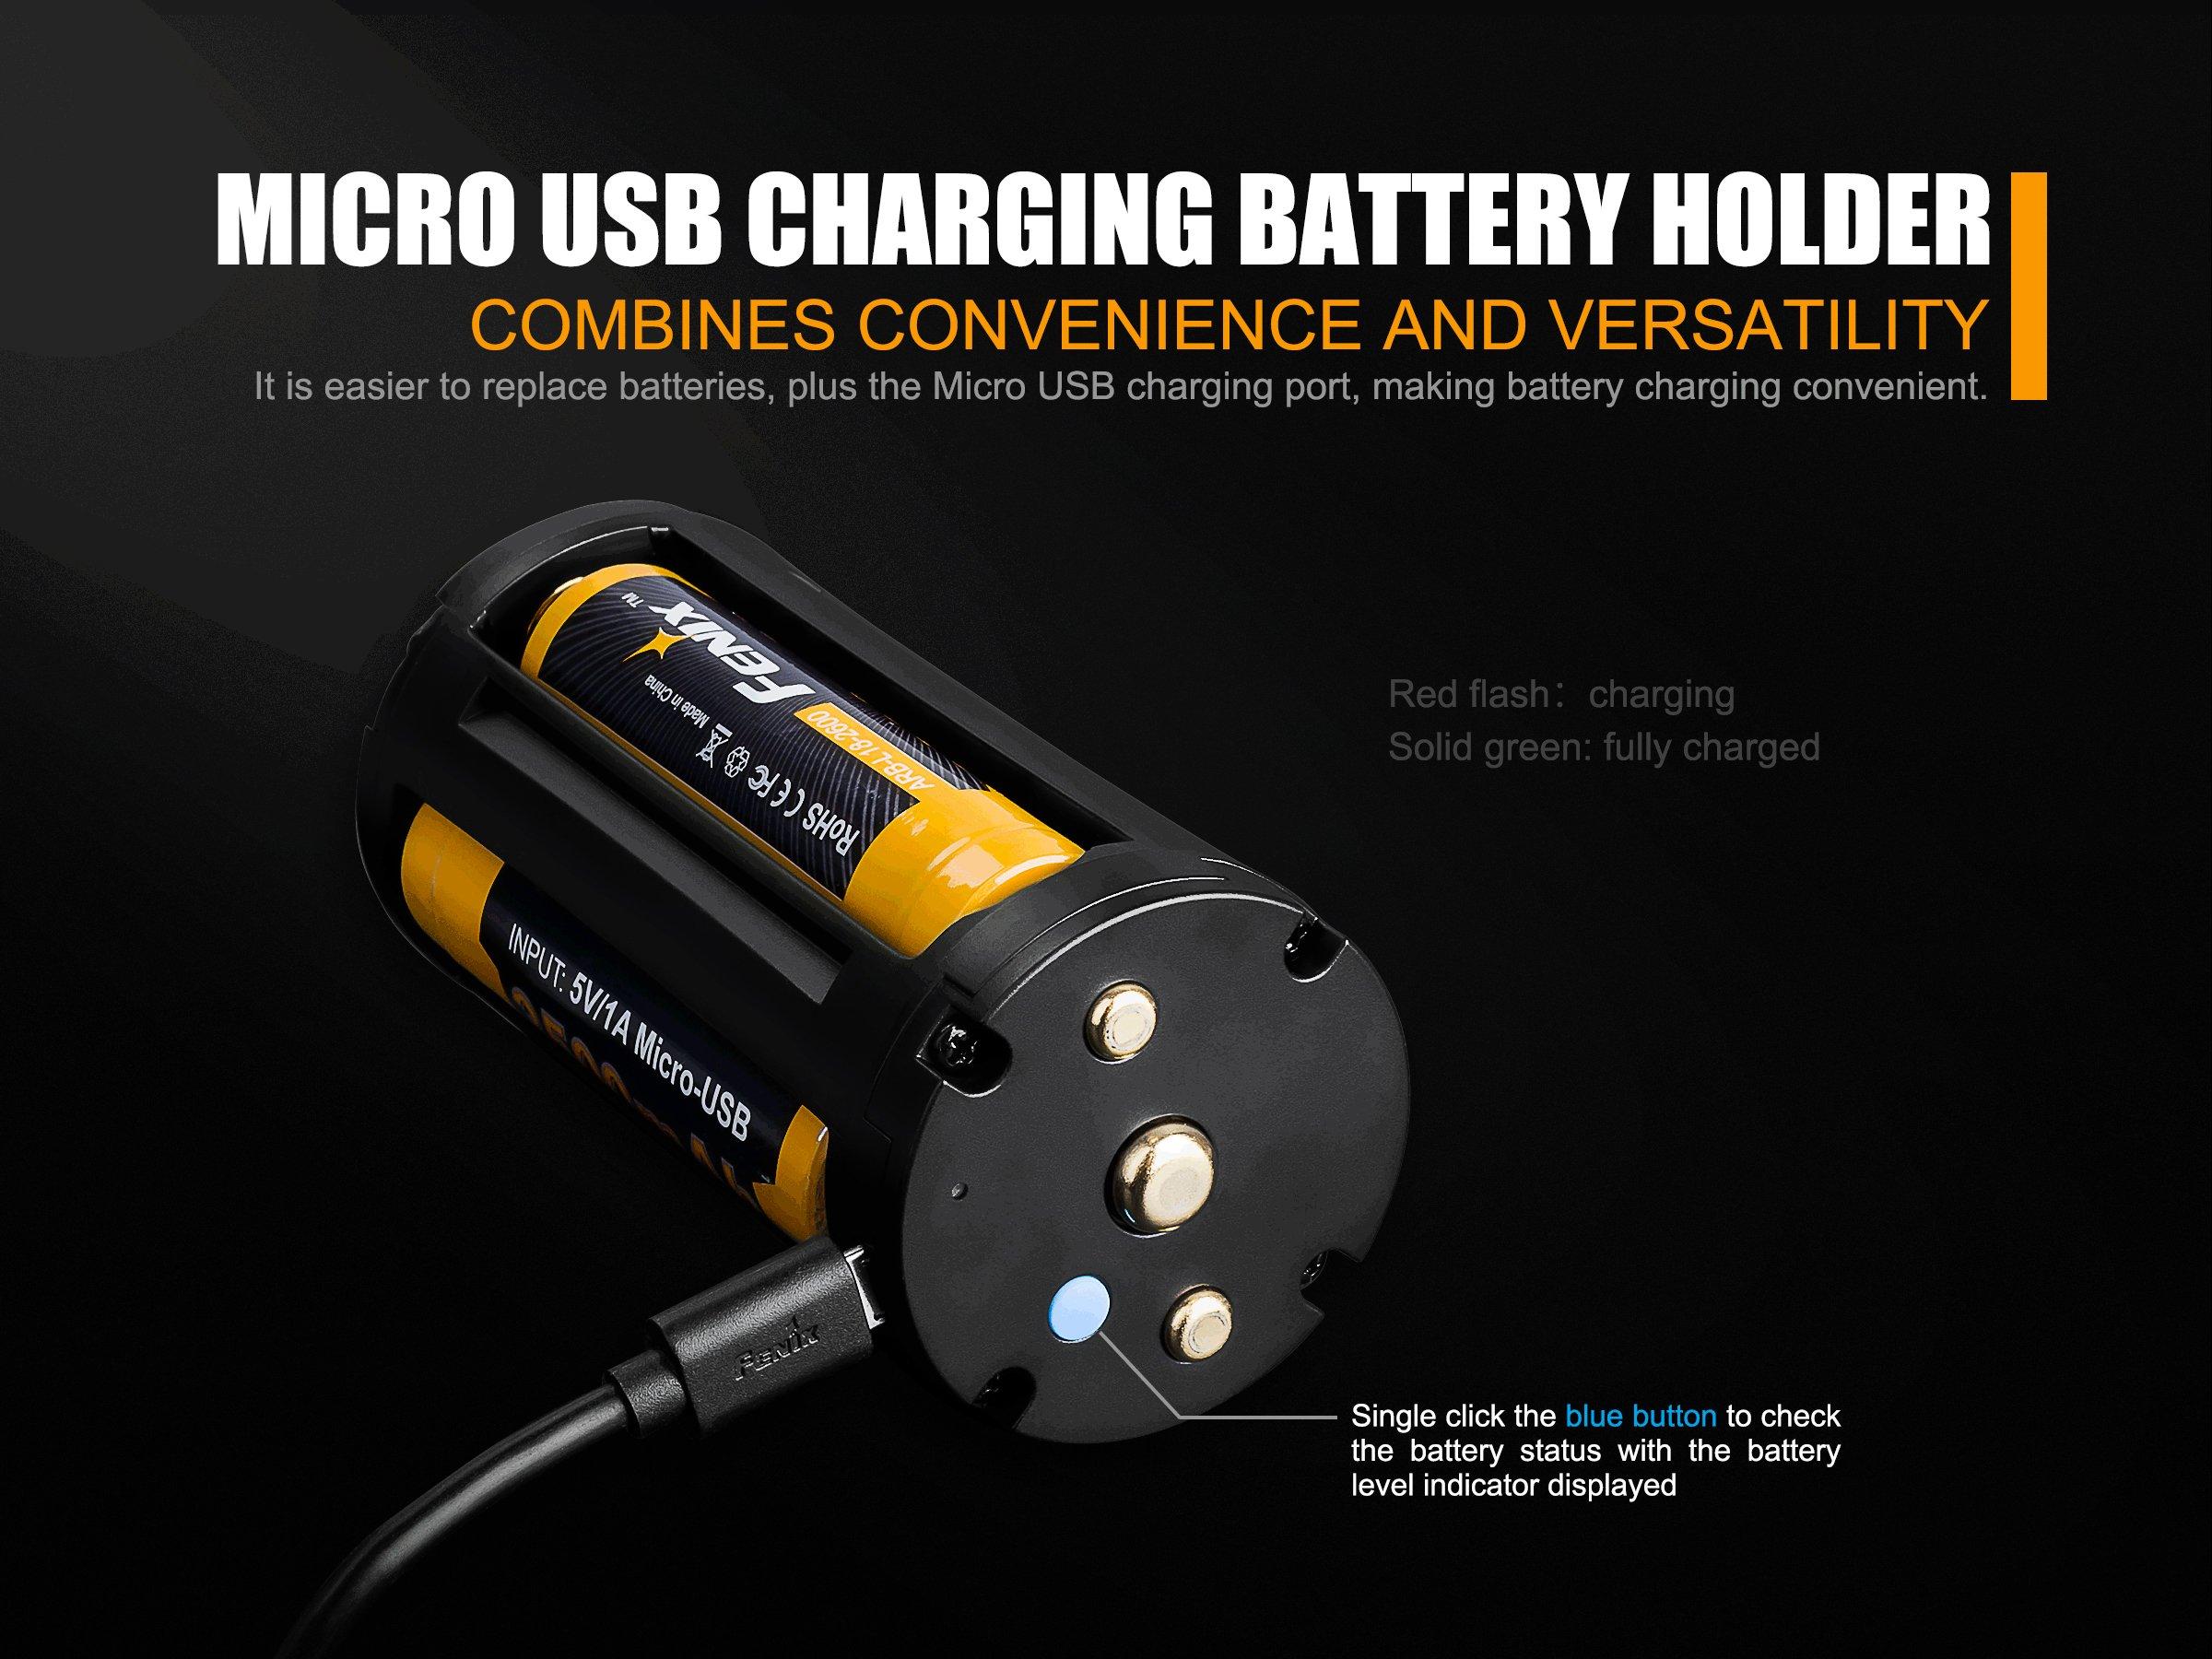 Fenix TK75 2018 5100 Lumens High-Performance Long-Throw Micro-USB Rechargeable Flashlight, 4x 3500mAh 18650 Rechargeable Batteries, 2x Lumen Tactical Battery Organizers by Fenix (Image #6)